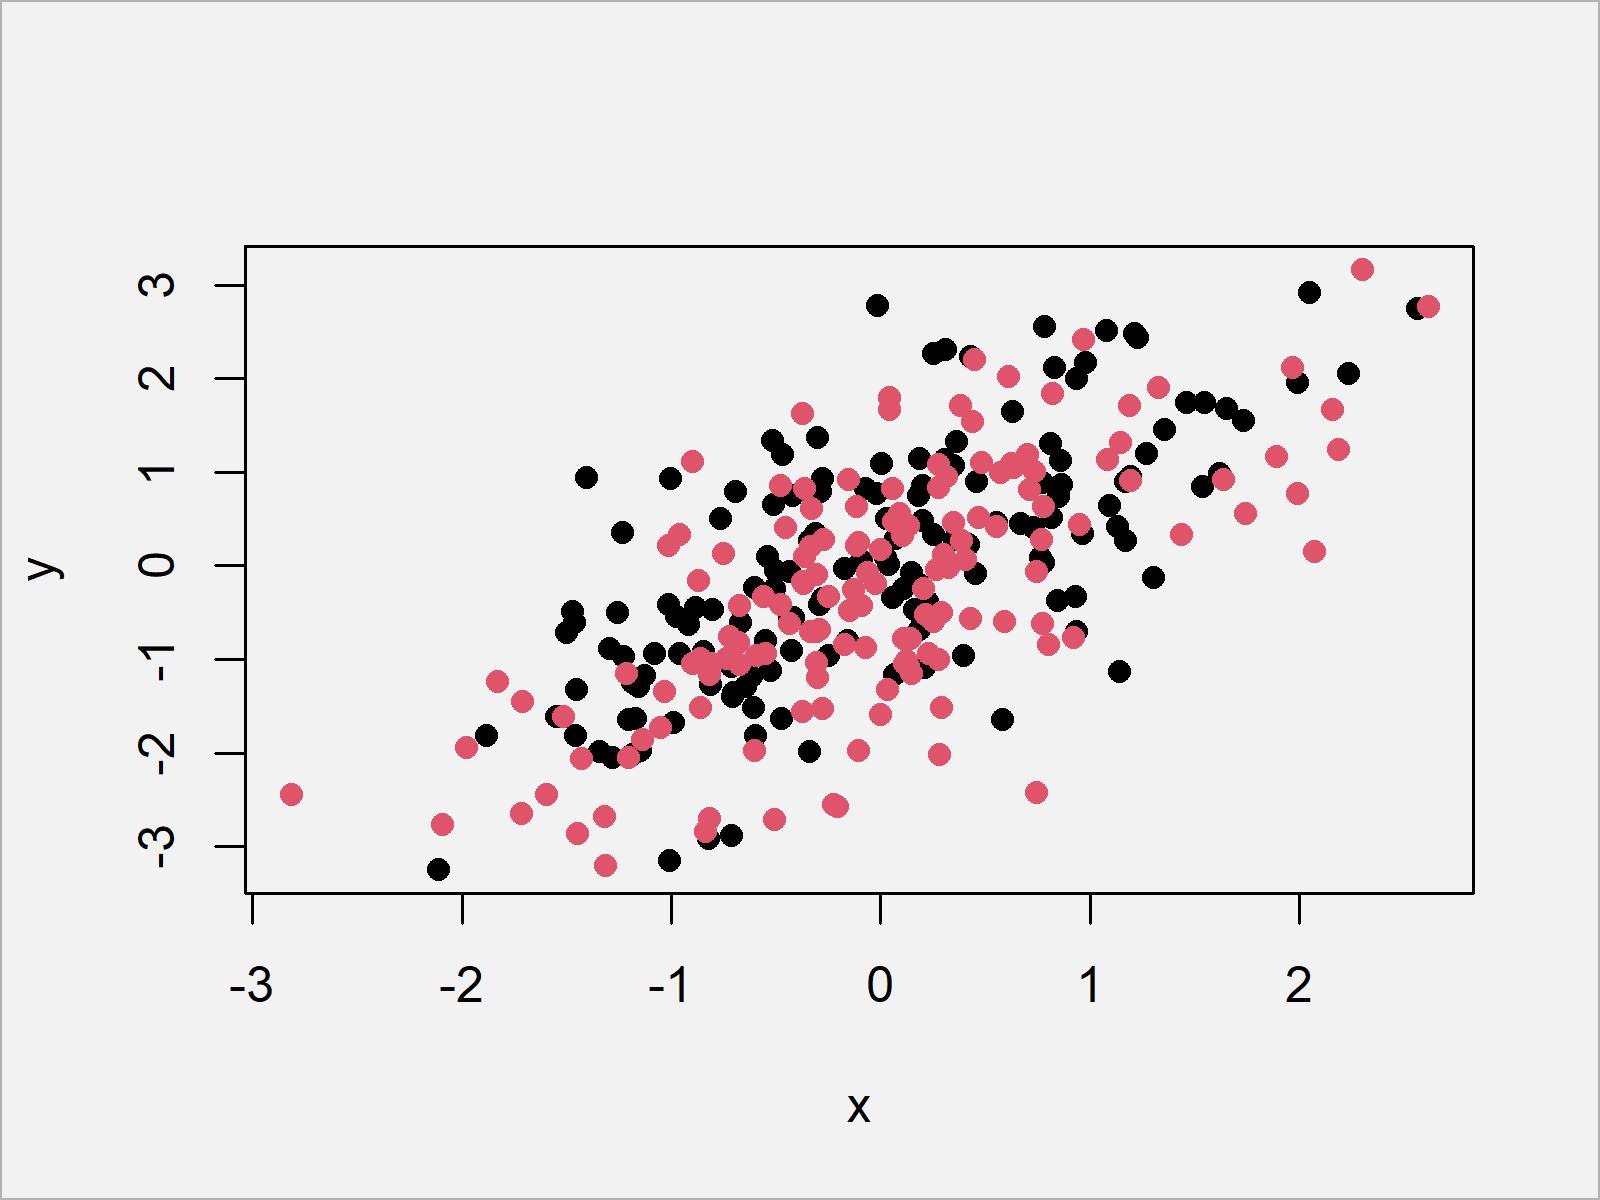 r graph figure 1 add legend base